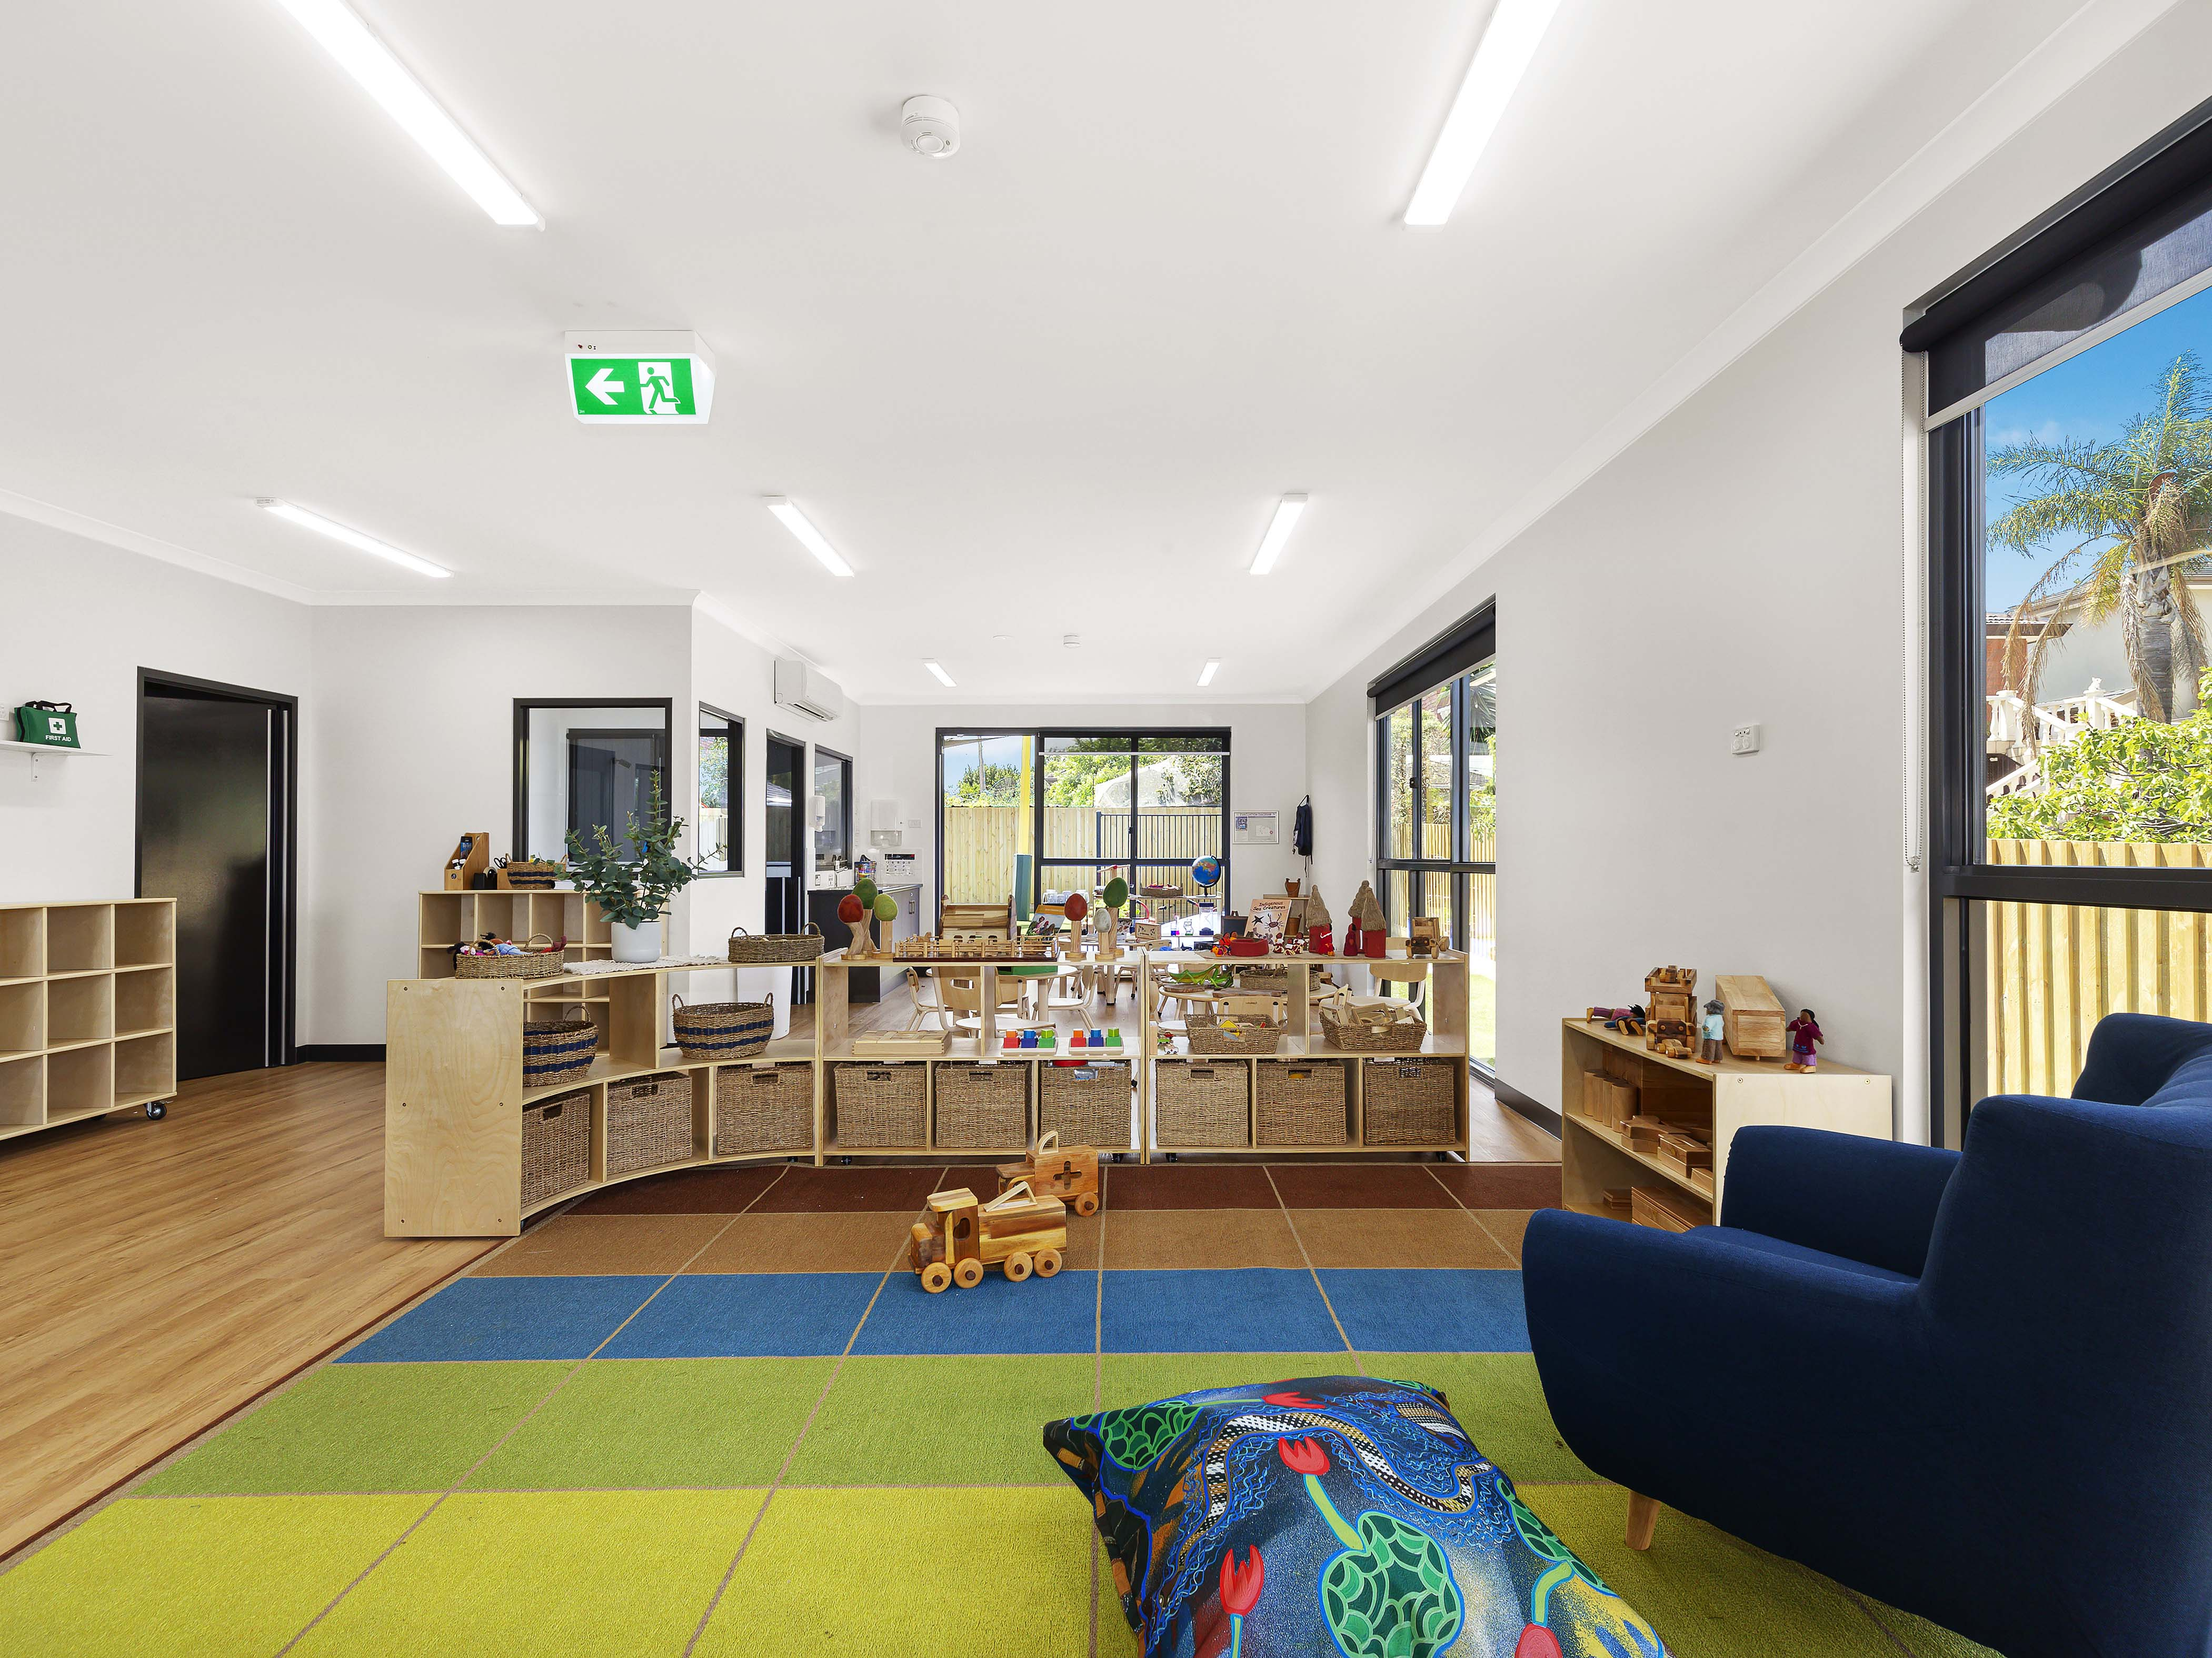 Noble Park Childcare